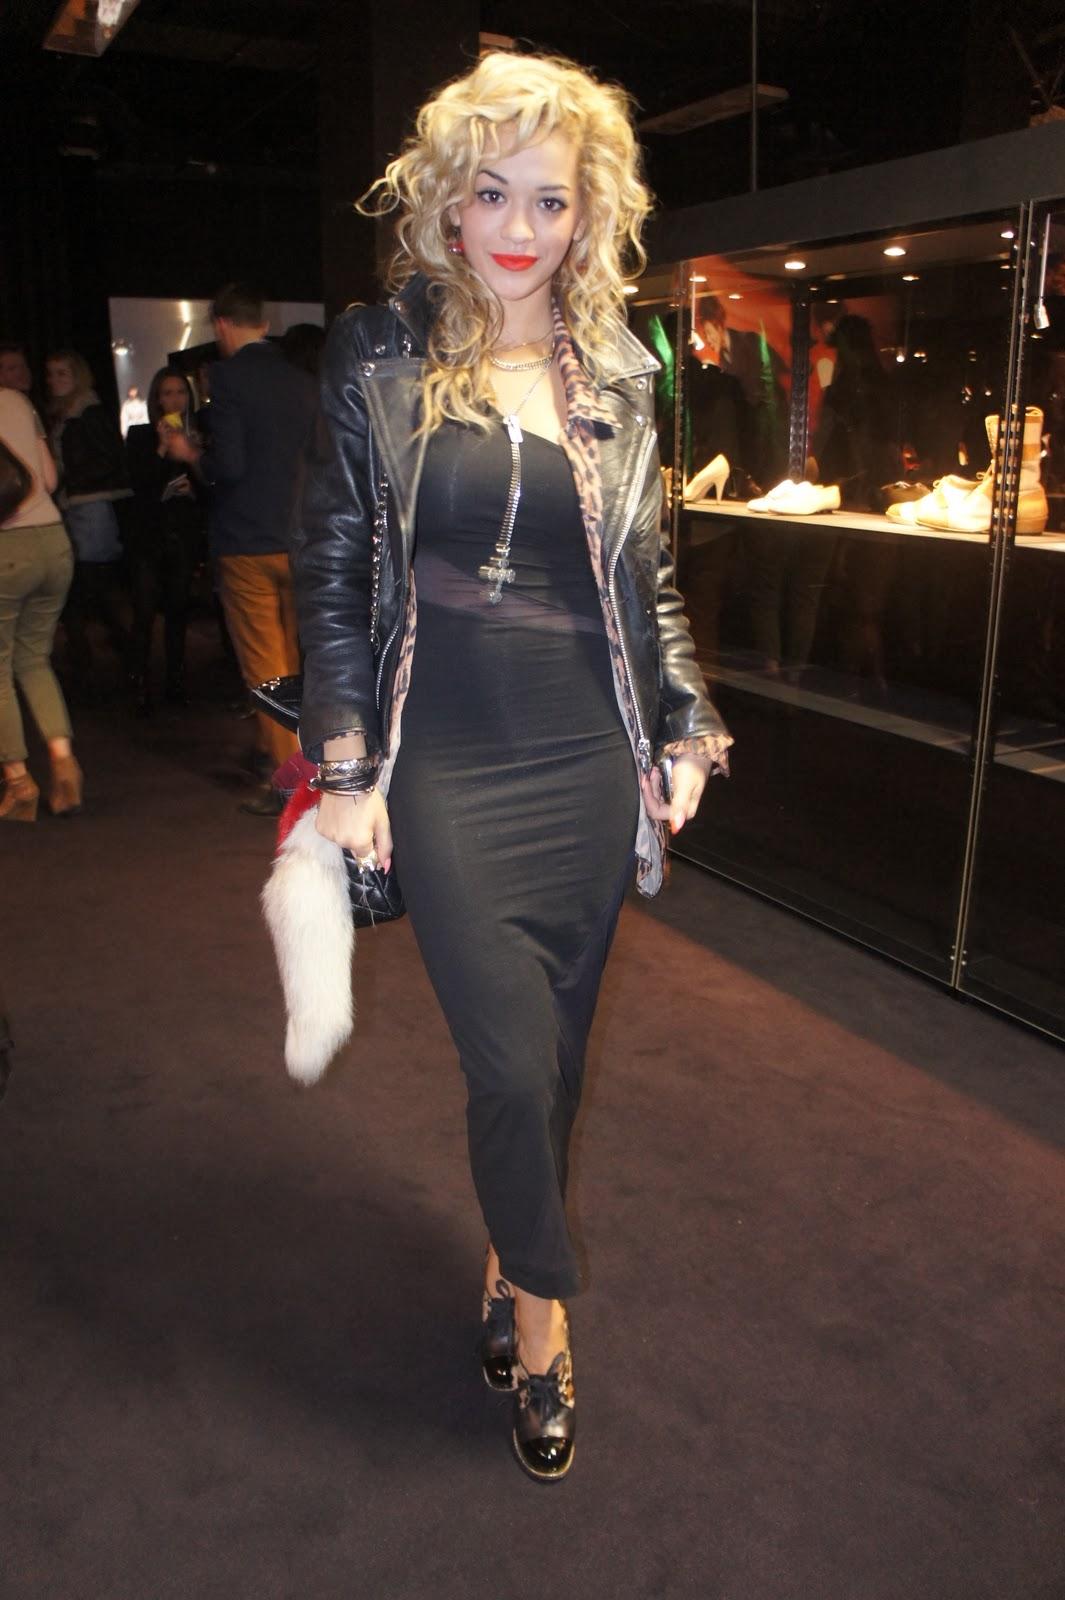 http://2.bp.blogspot.com/_4Bc8ECXYLUU/TJzIsVLOsyI/AAAAAAAAAoA/Wwv3vRW3kDg/s1600/Vivienne_westwood_exhibition_selfridges_jada_styles_rita_ora.JPG